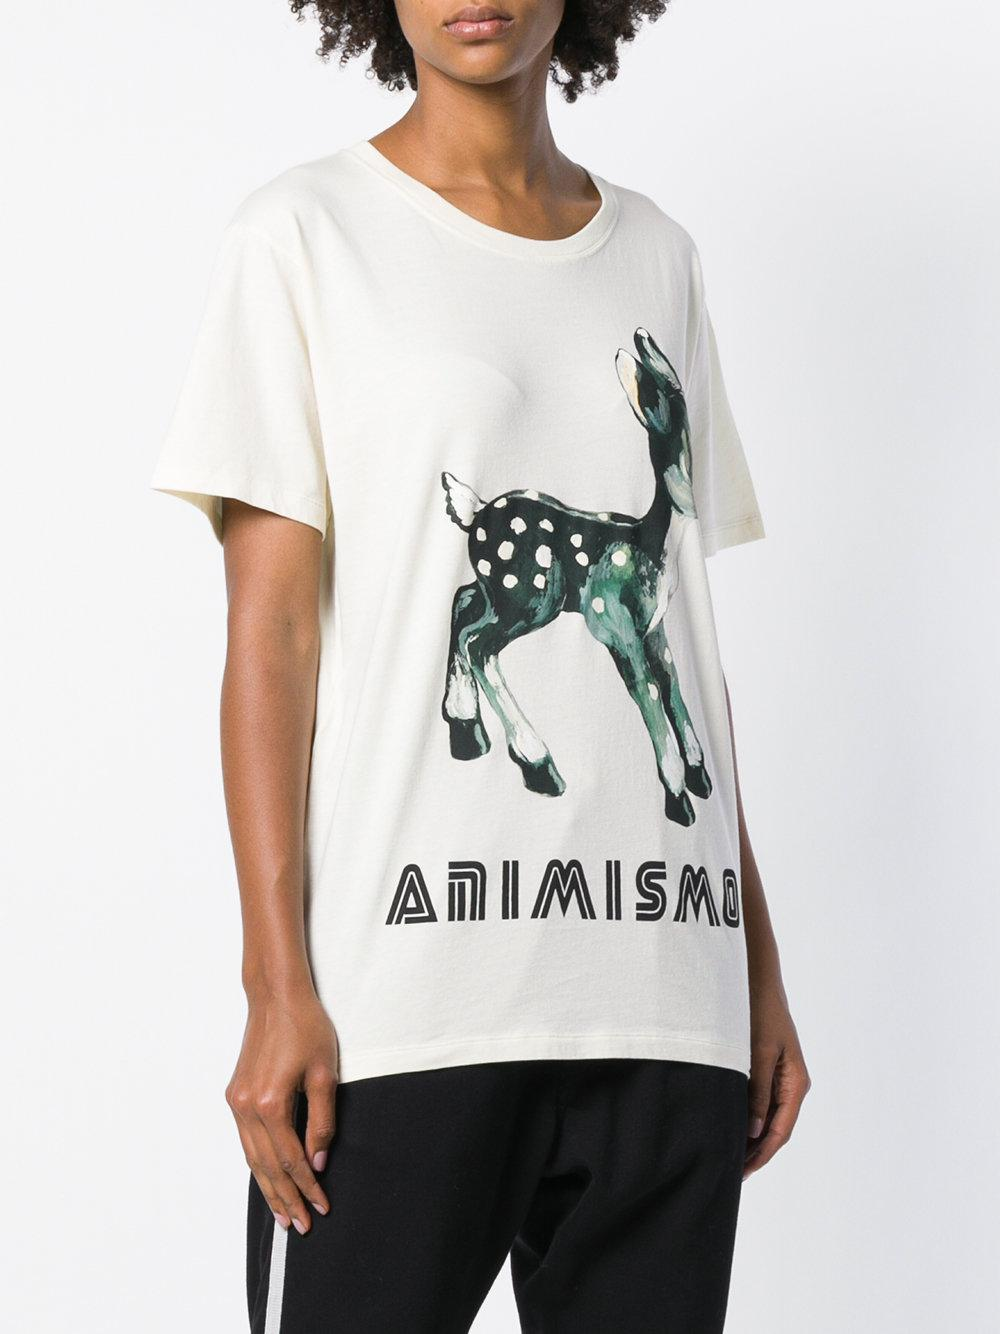 7fb3253b347 Lyst - Gucci Bambi Animismo T-shirt